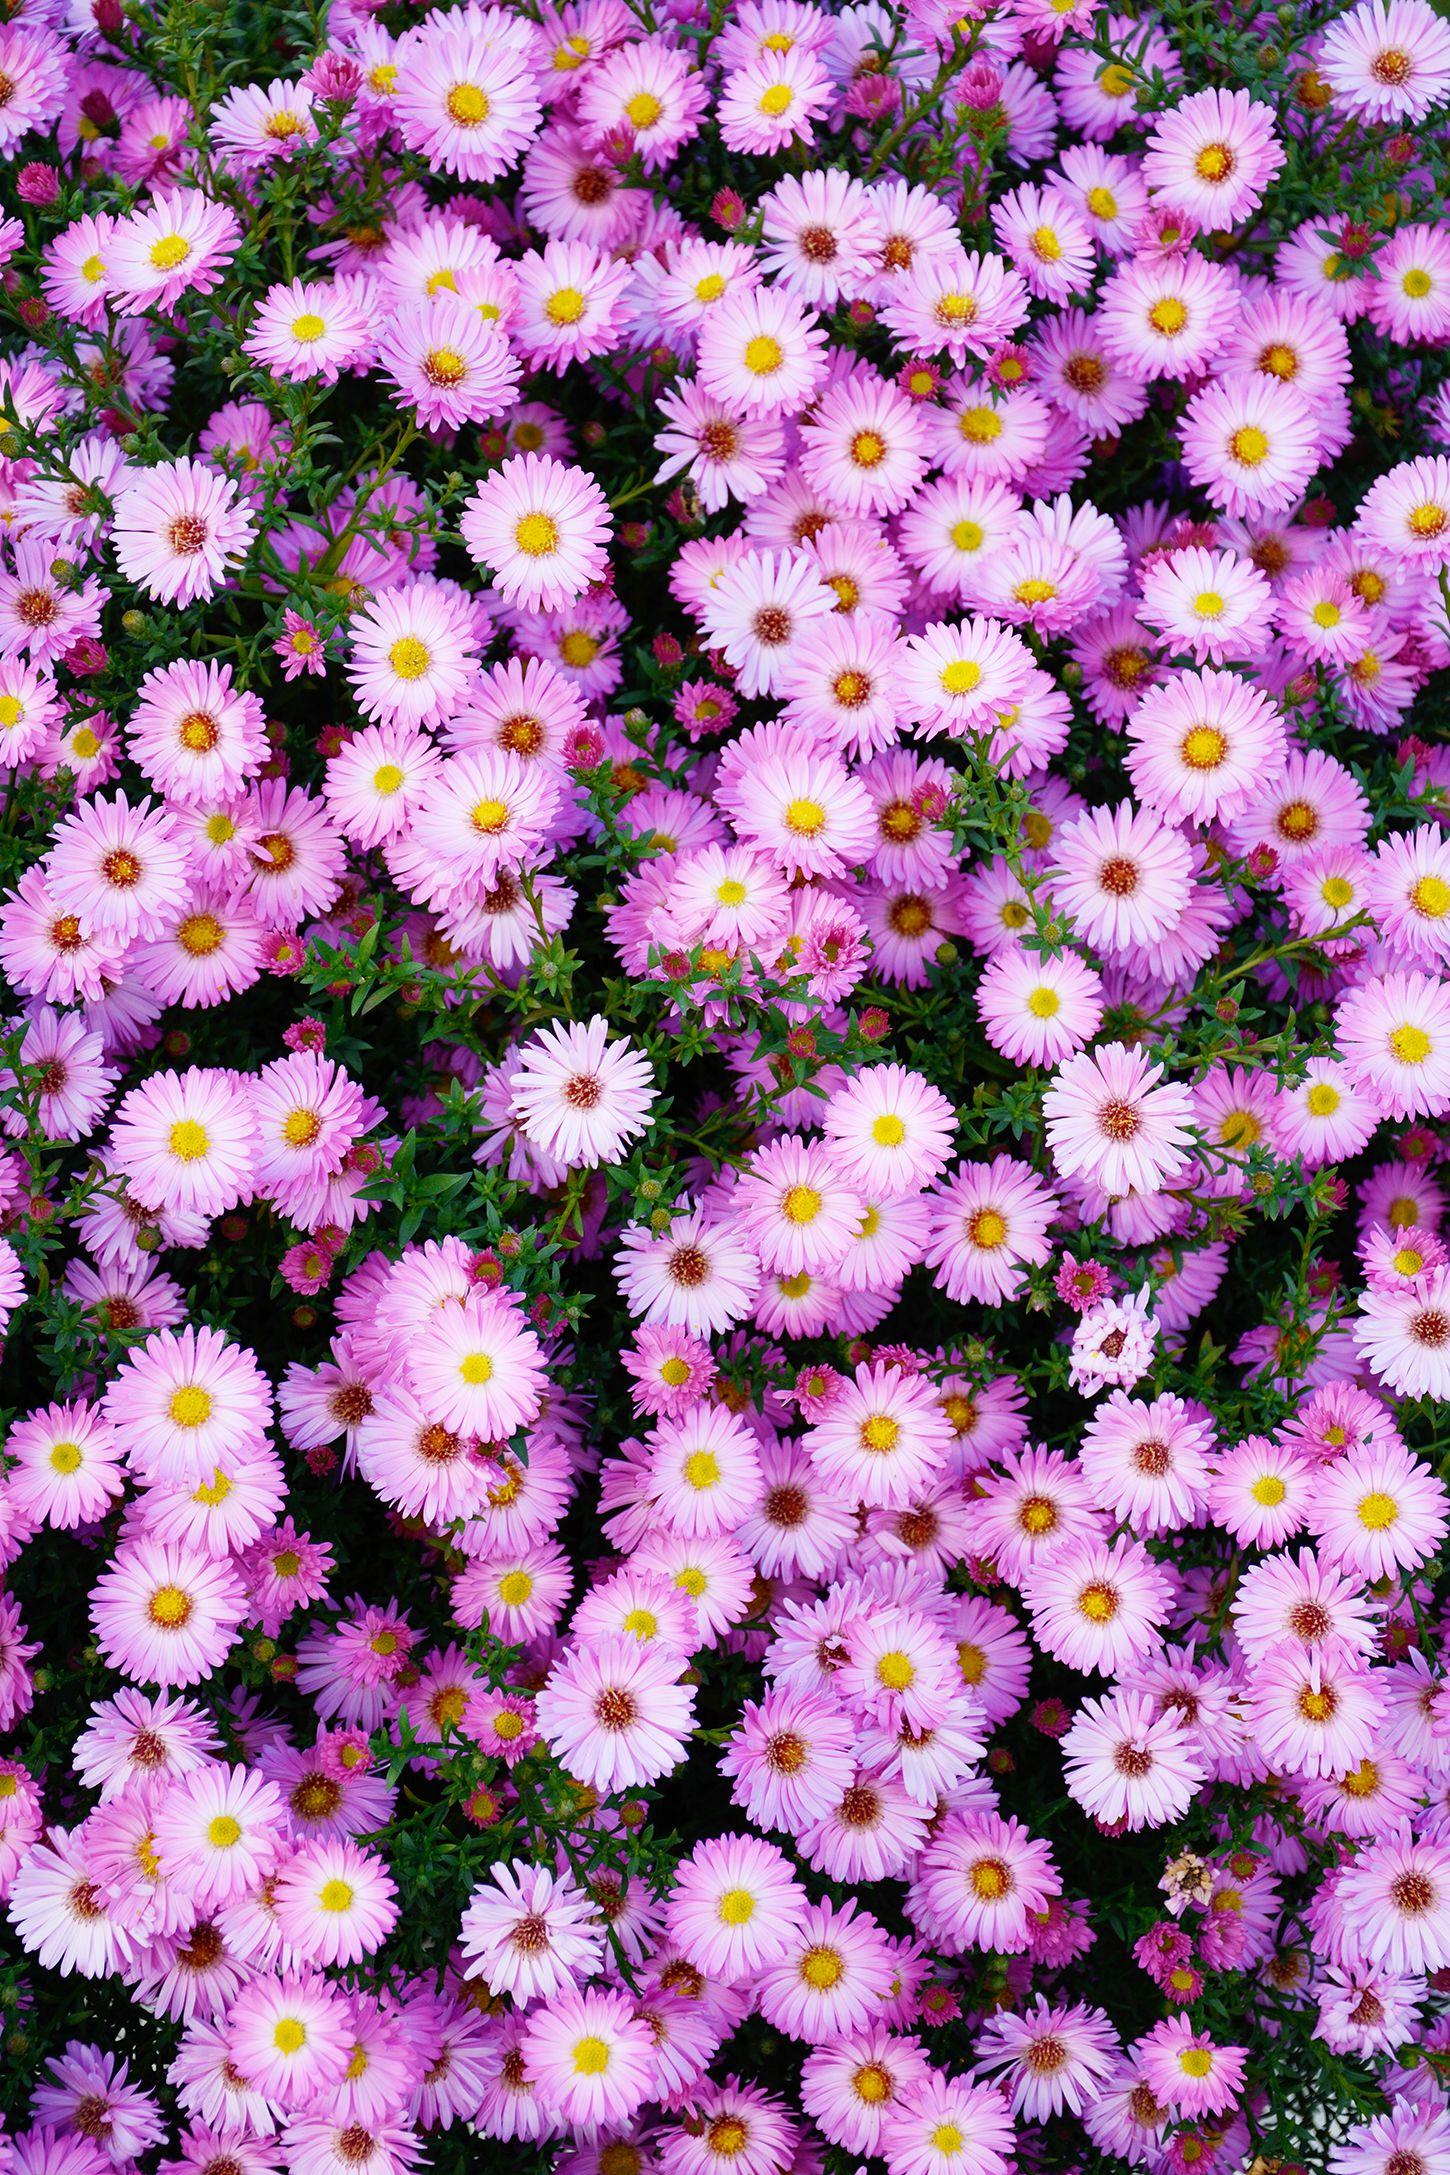 20 Best Perennial Flowers , Ideas for Easy Perennial